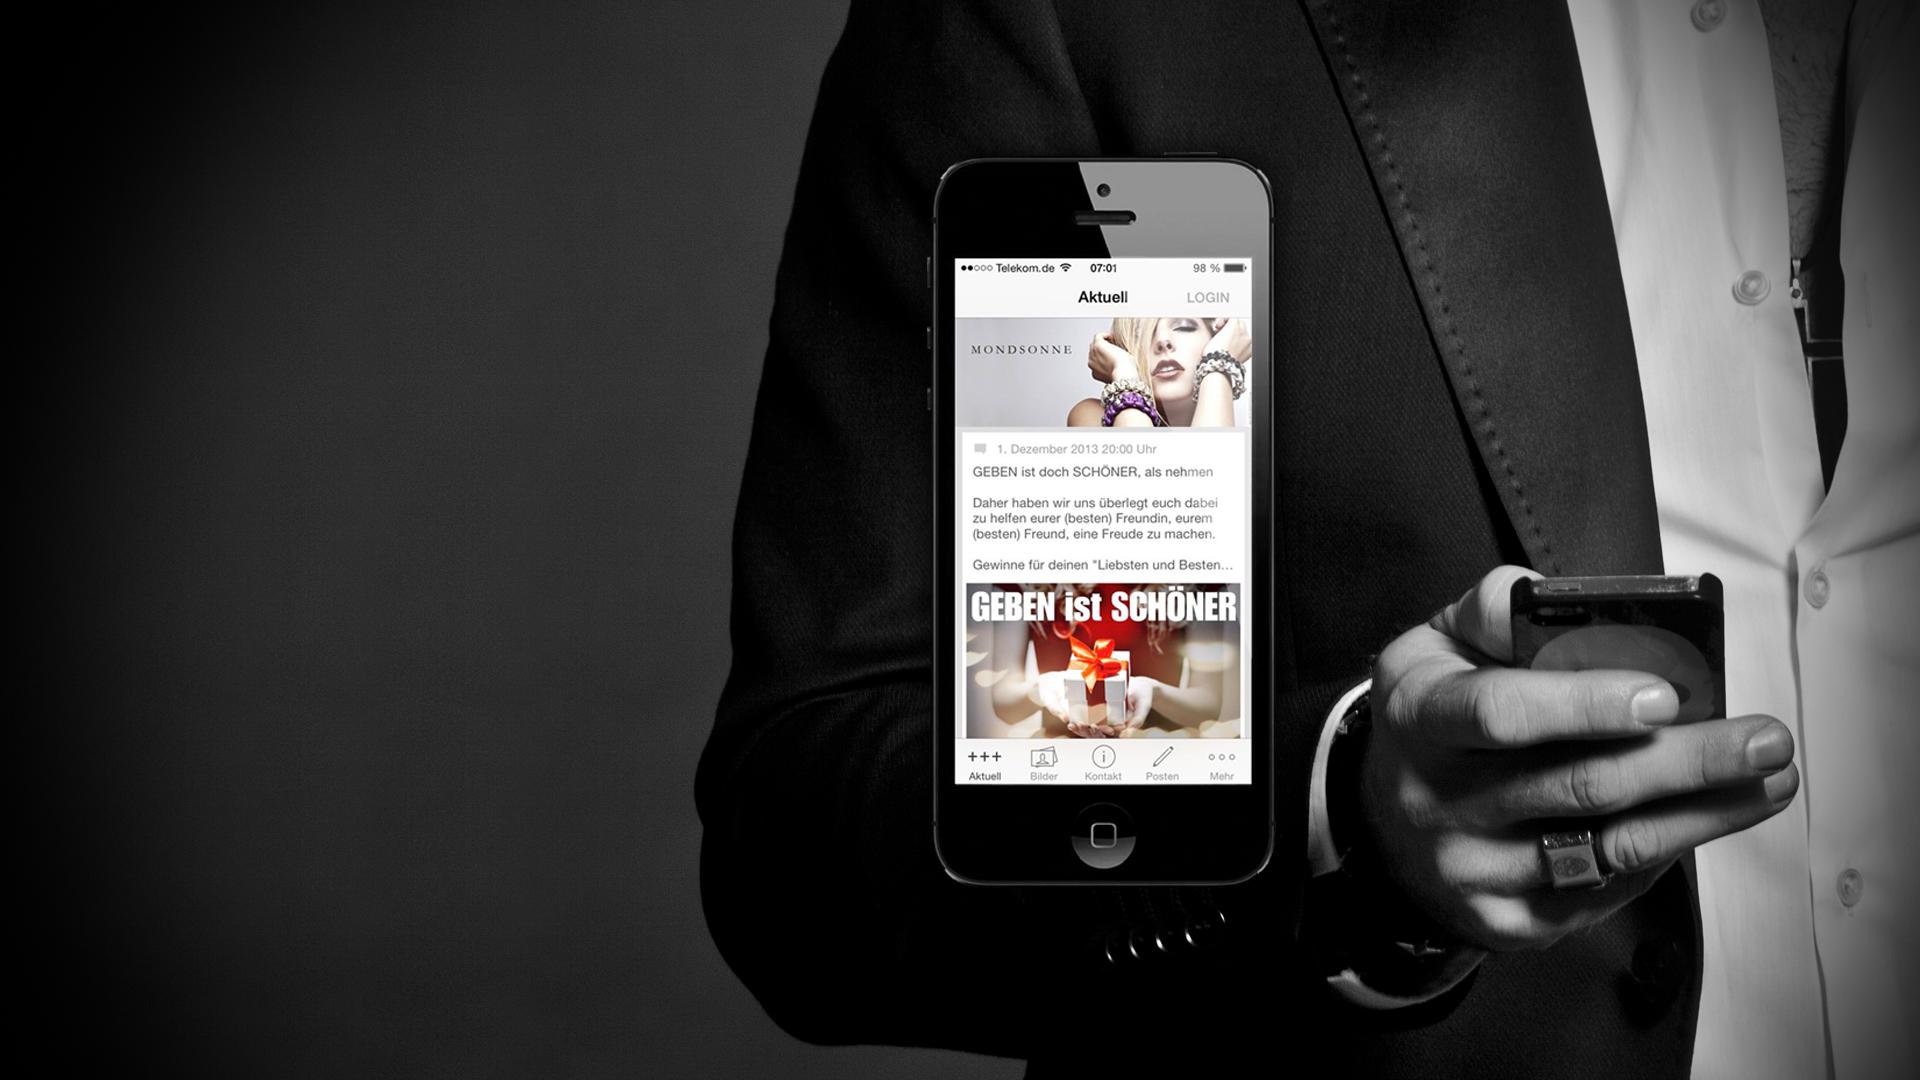 mondsonne-app